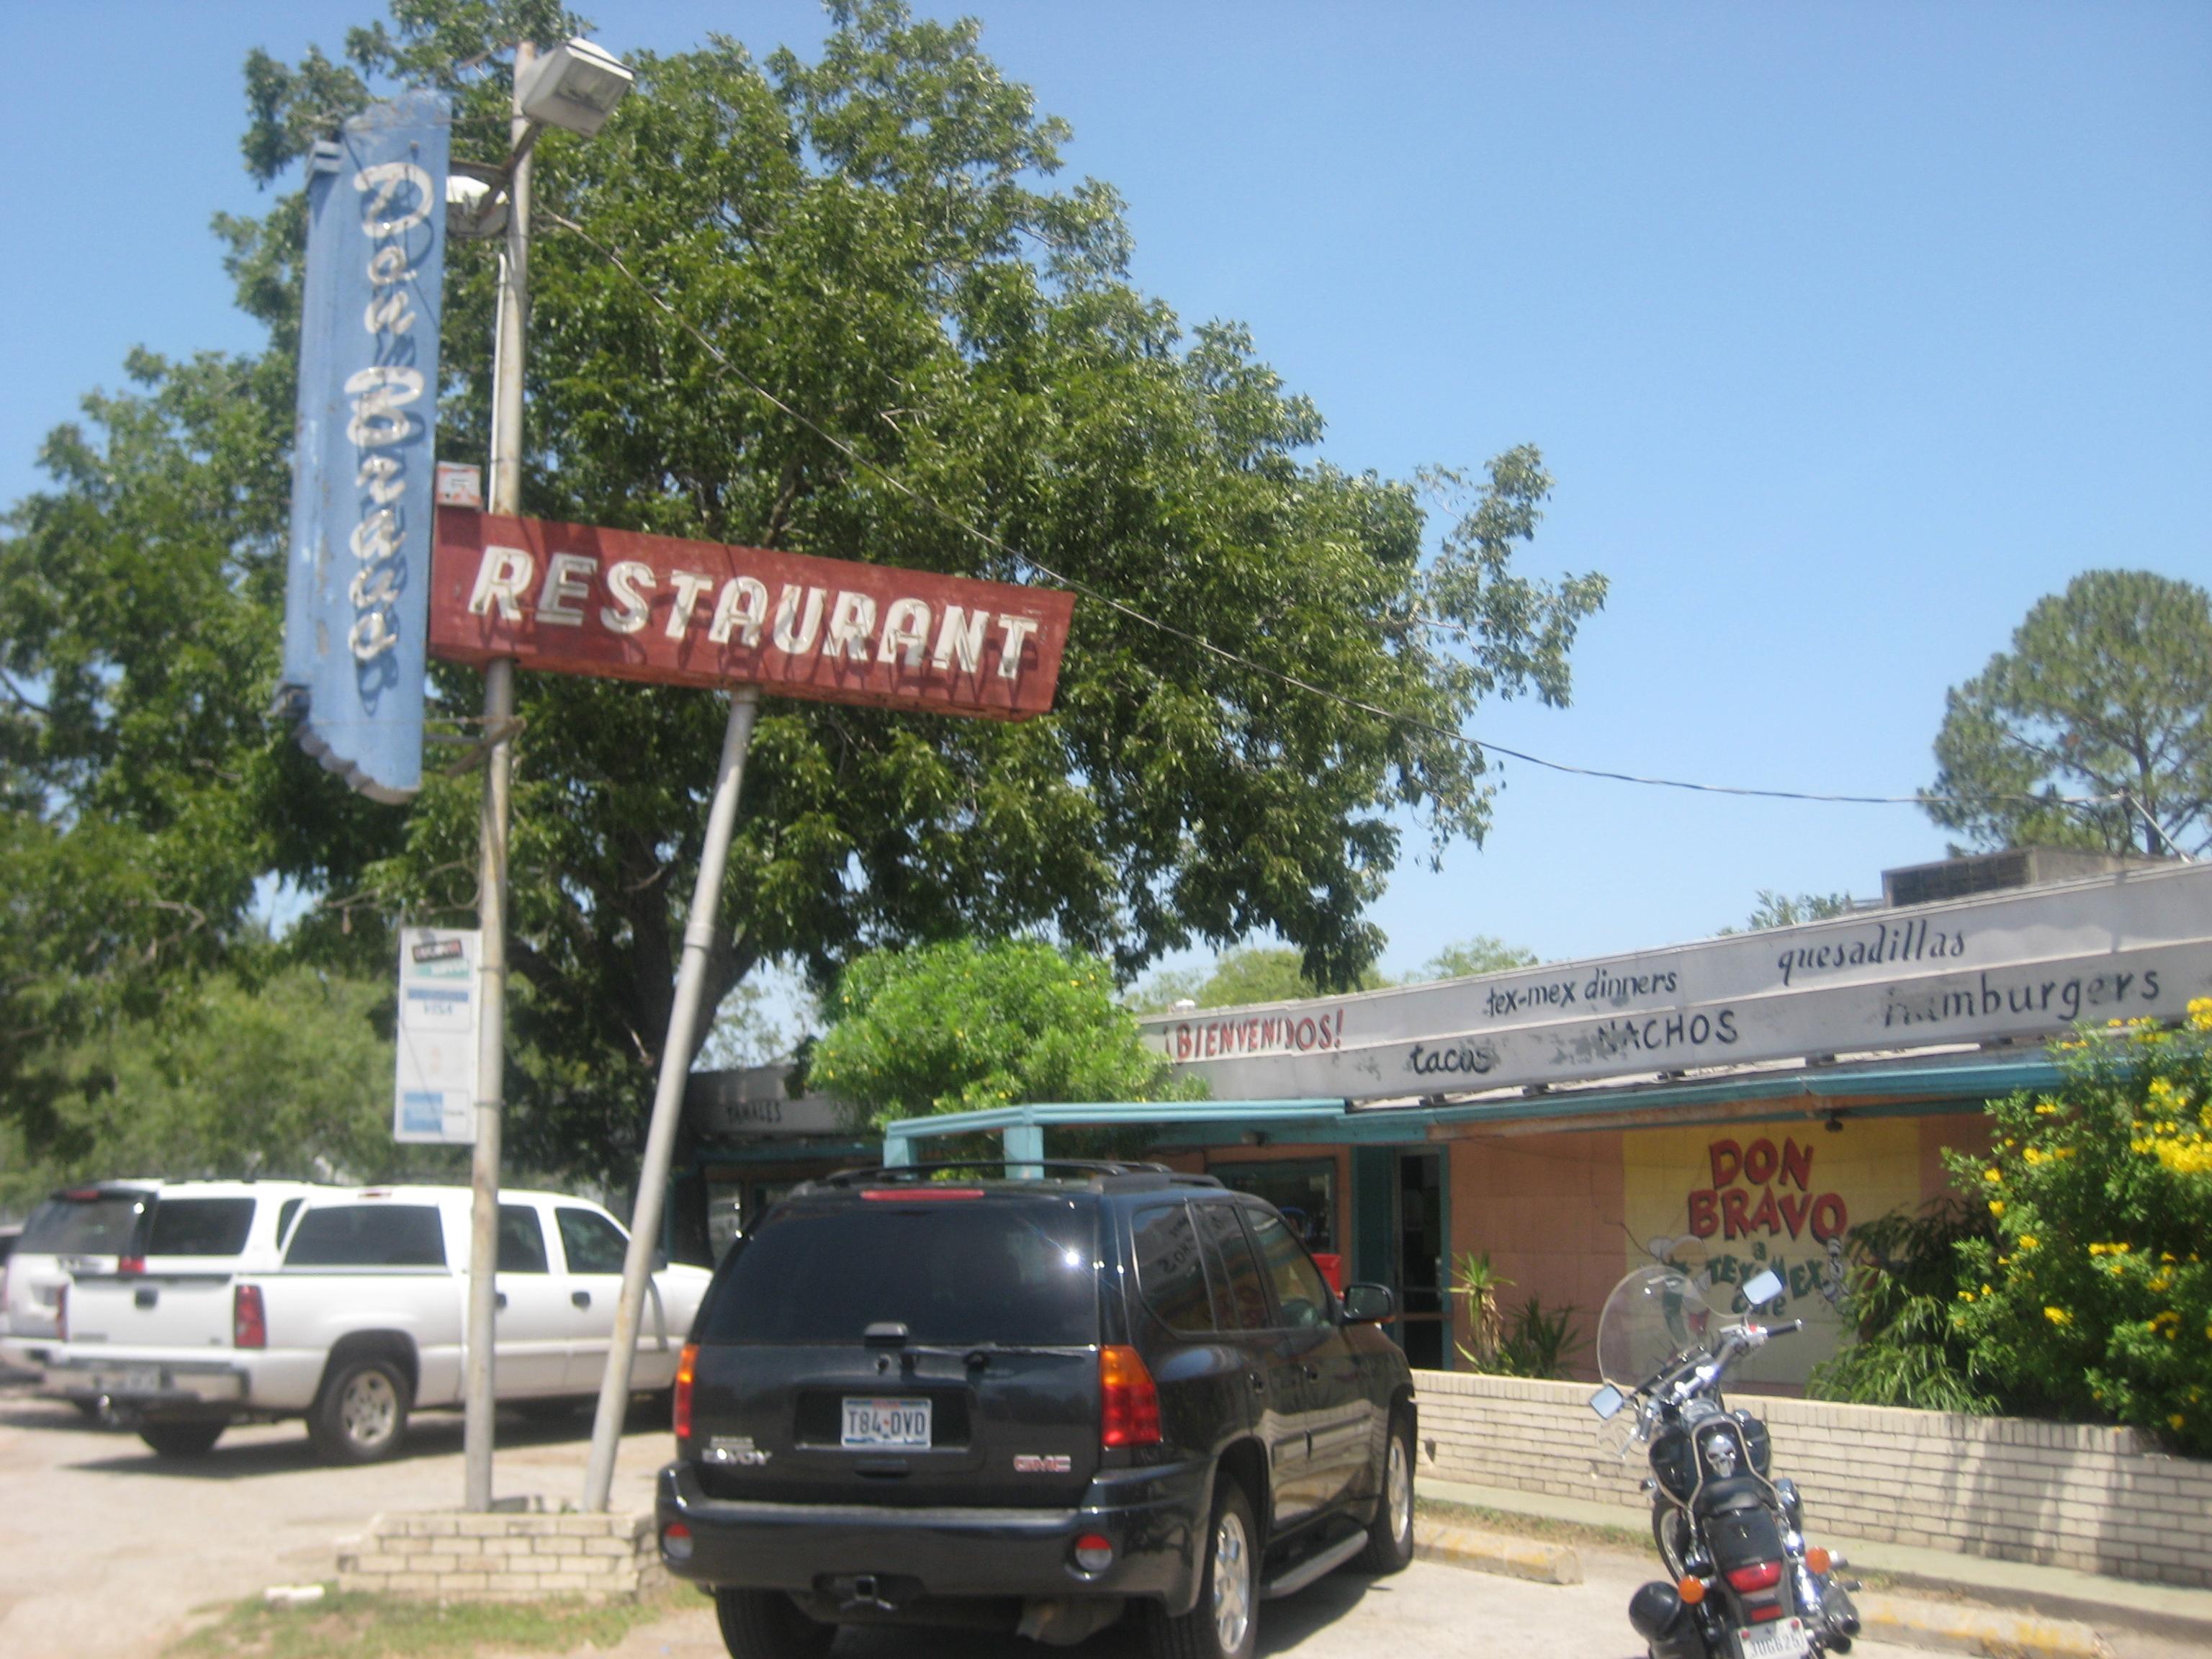 Don Bravo's Cuero Texas